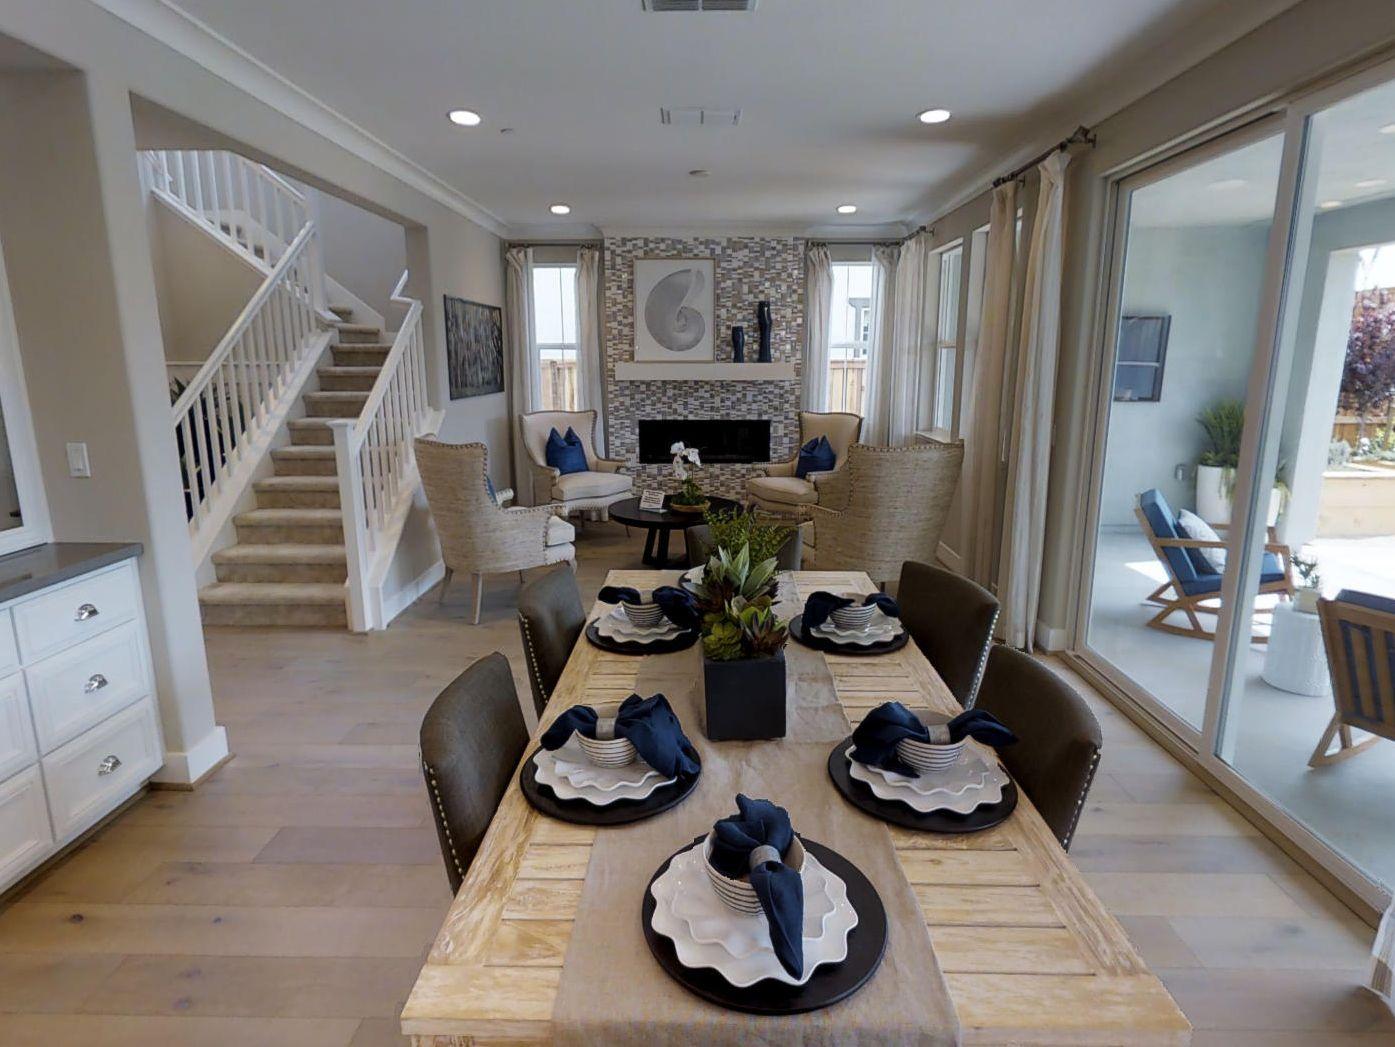 Delicieux Mountain House   Ashford; Ashford Plan 4; Ashford Plan 2 Great Room ...